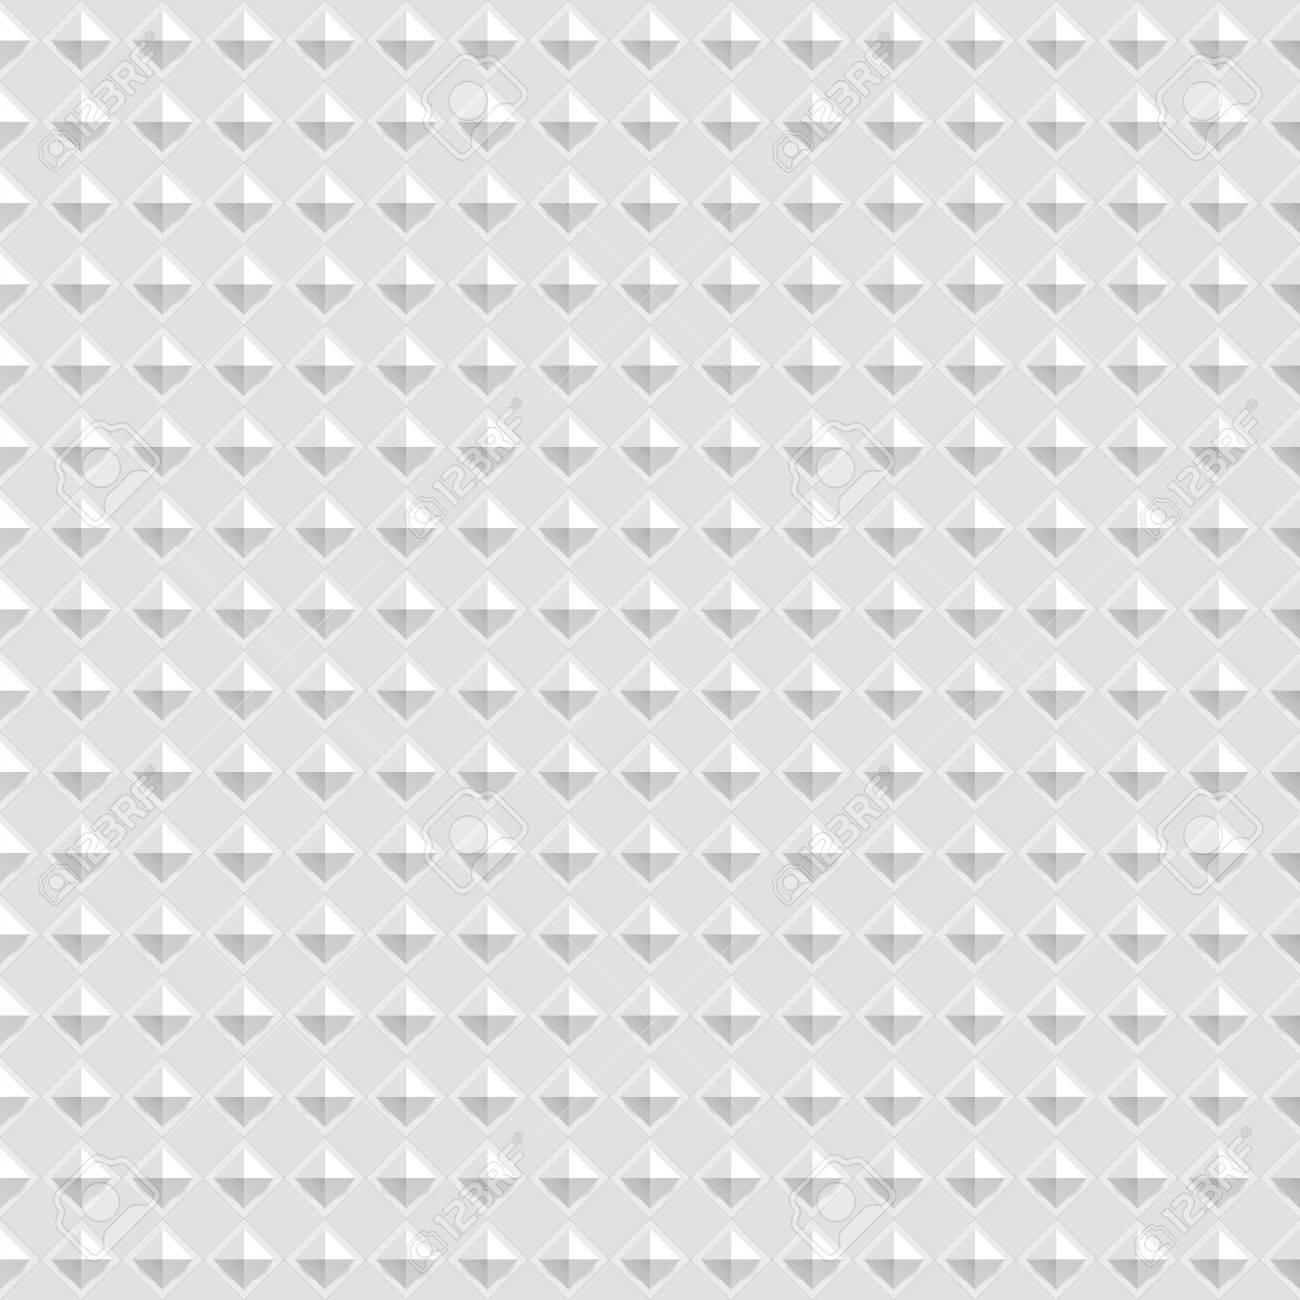 Surprising Black Plastic Diamond Plate Sheets Ideas - Best Image ... Surprising Black Plastic Diamond Plate Sheets Ideas Best Image  sc 1 st  Best Image Engine & Fascinating 4X8 Plastic Diamond Plate Pictures - Best Image Engine ...